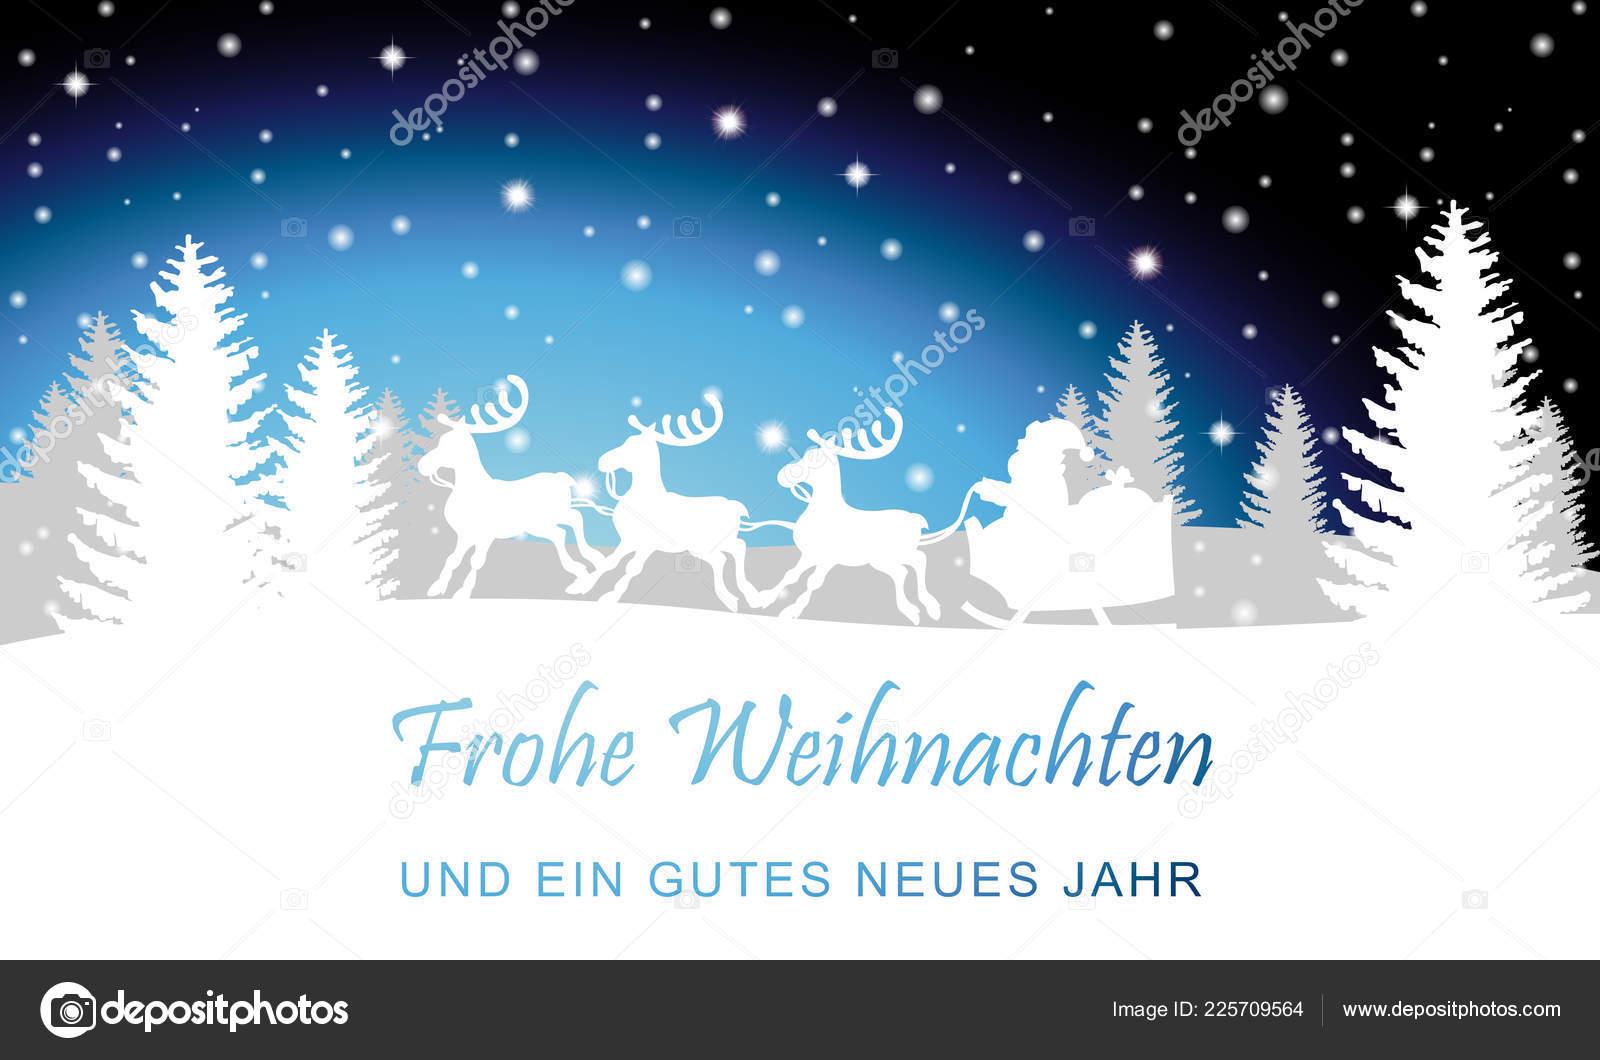 Winter landscape reindeer holiday greetings stock vector ii winter landscape reindeer holiday greetings stock vector m4hsunfo